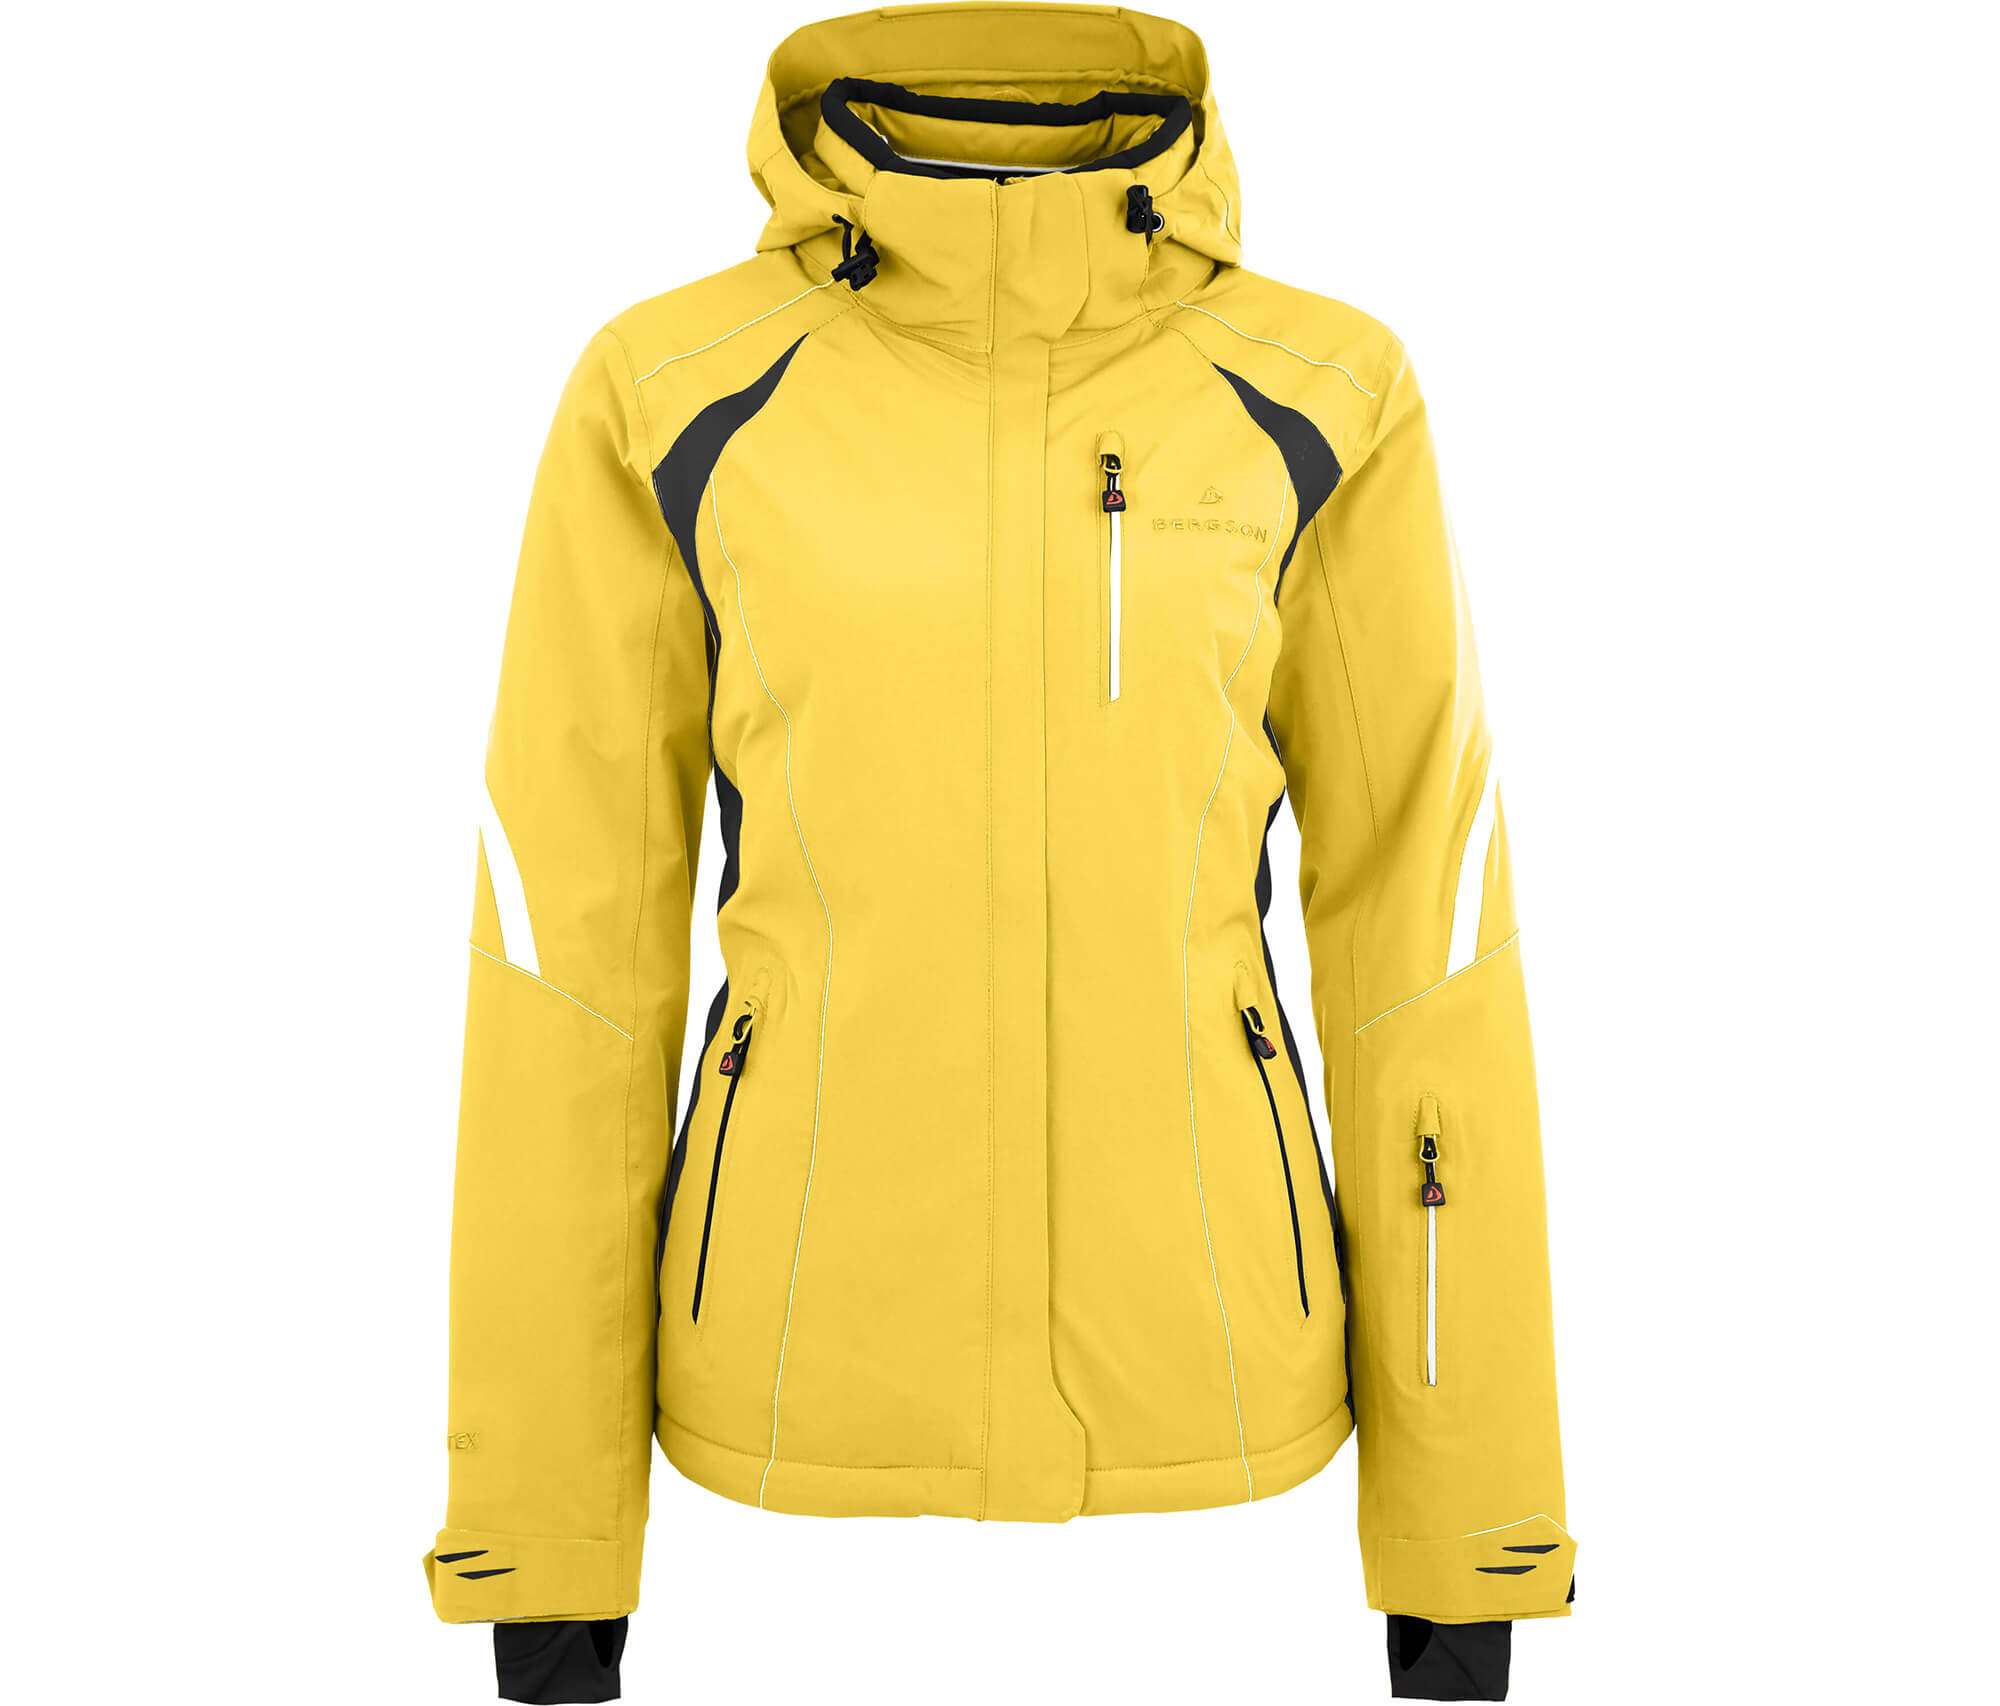 Damen Skijacke Snowtastic Bergson Lemon Gelb qSzVMpU